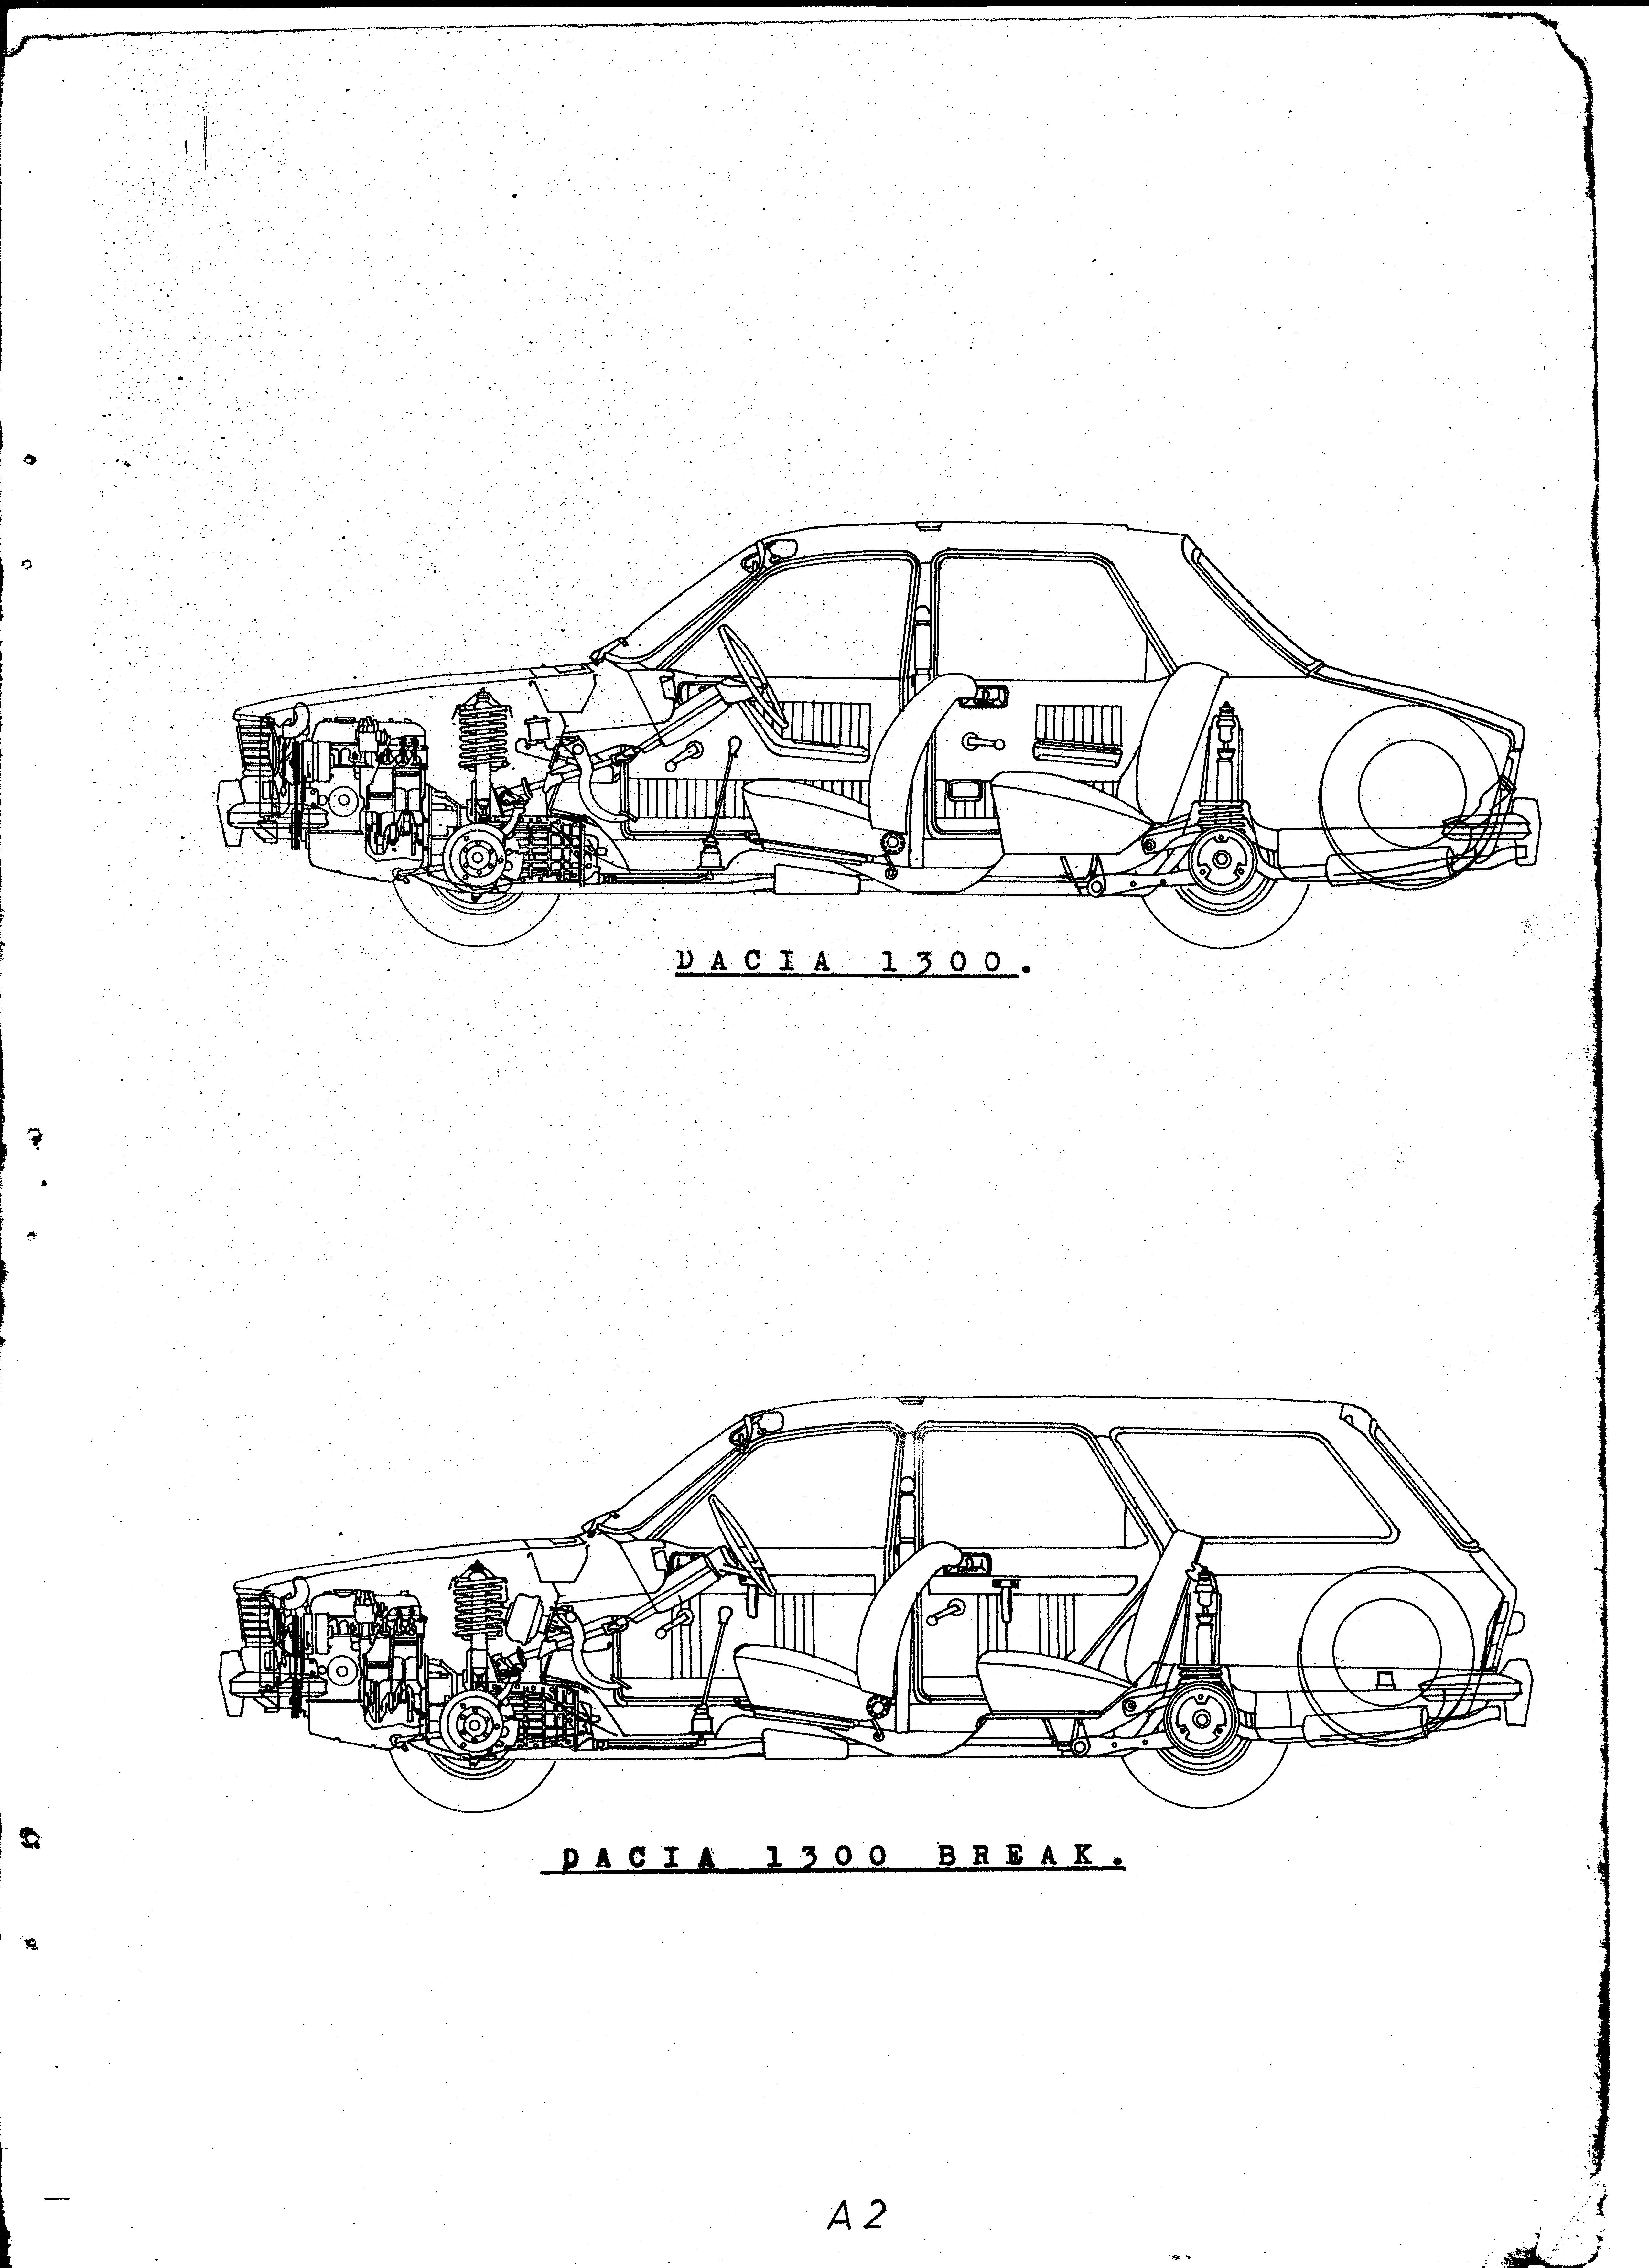 A 2.jpg